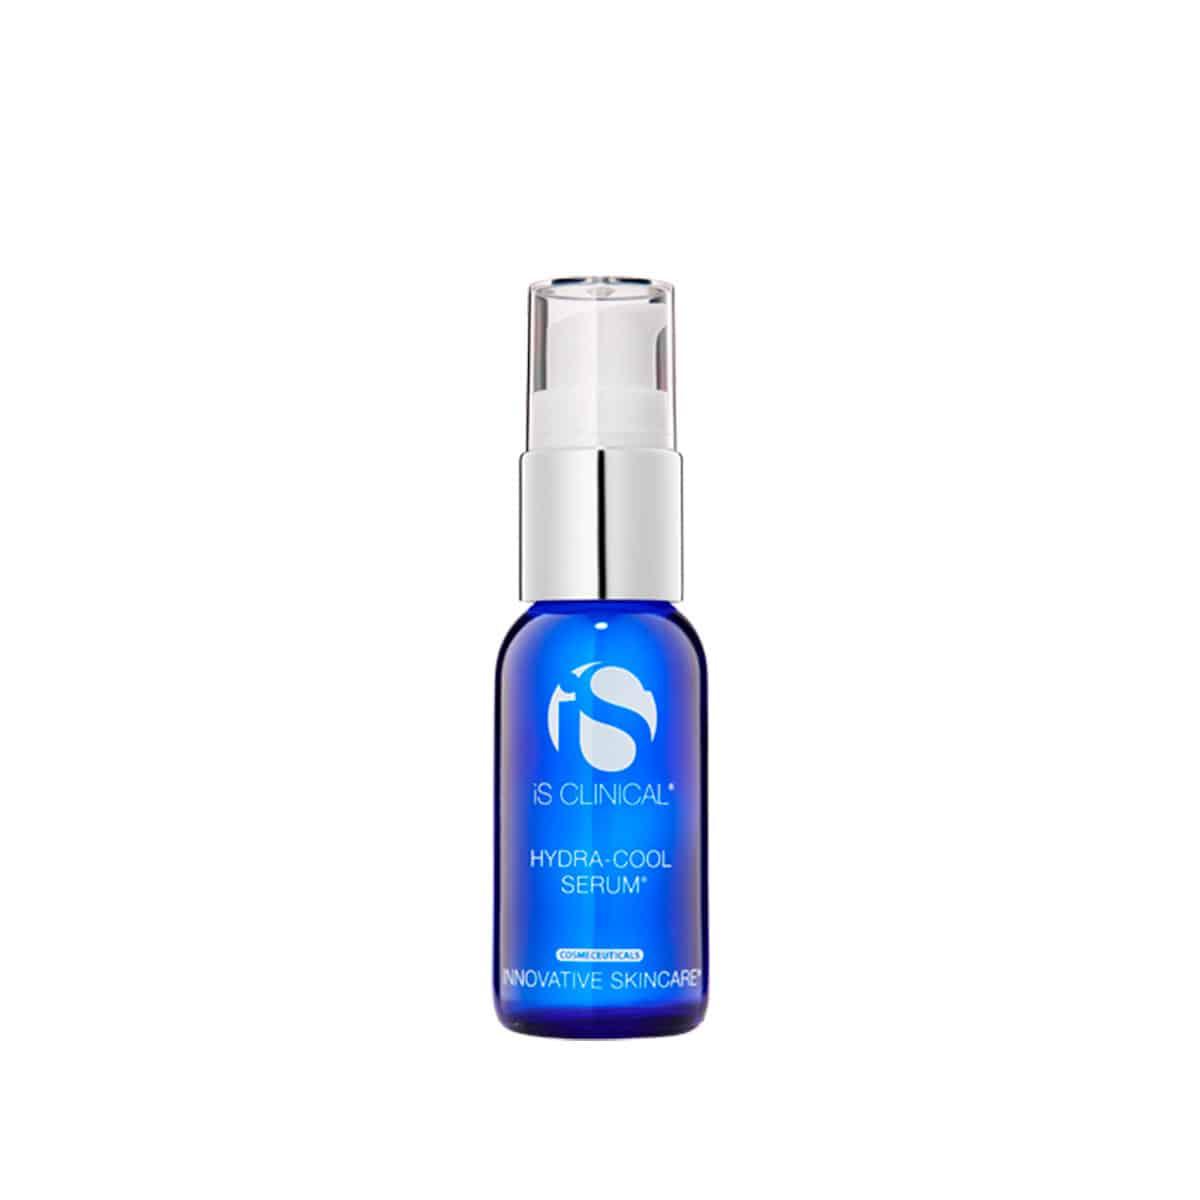 IS CLINICAL Hydra Cool(tm) Serum 30ml